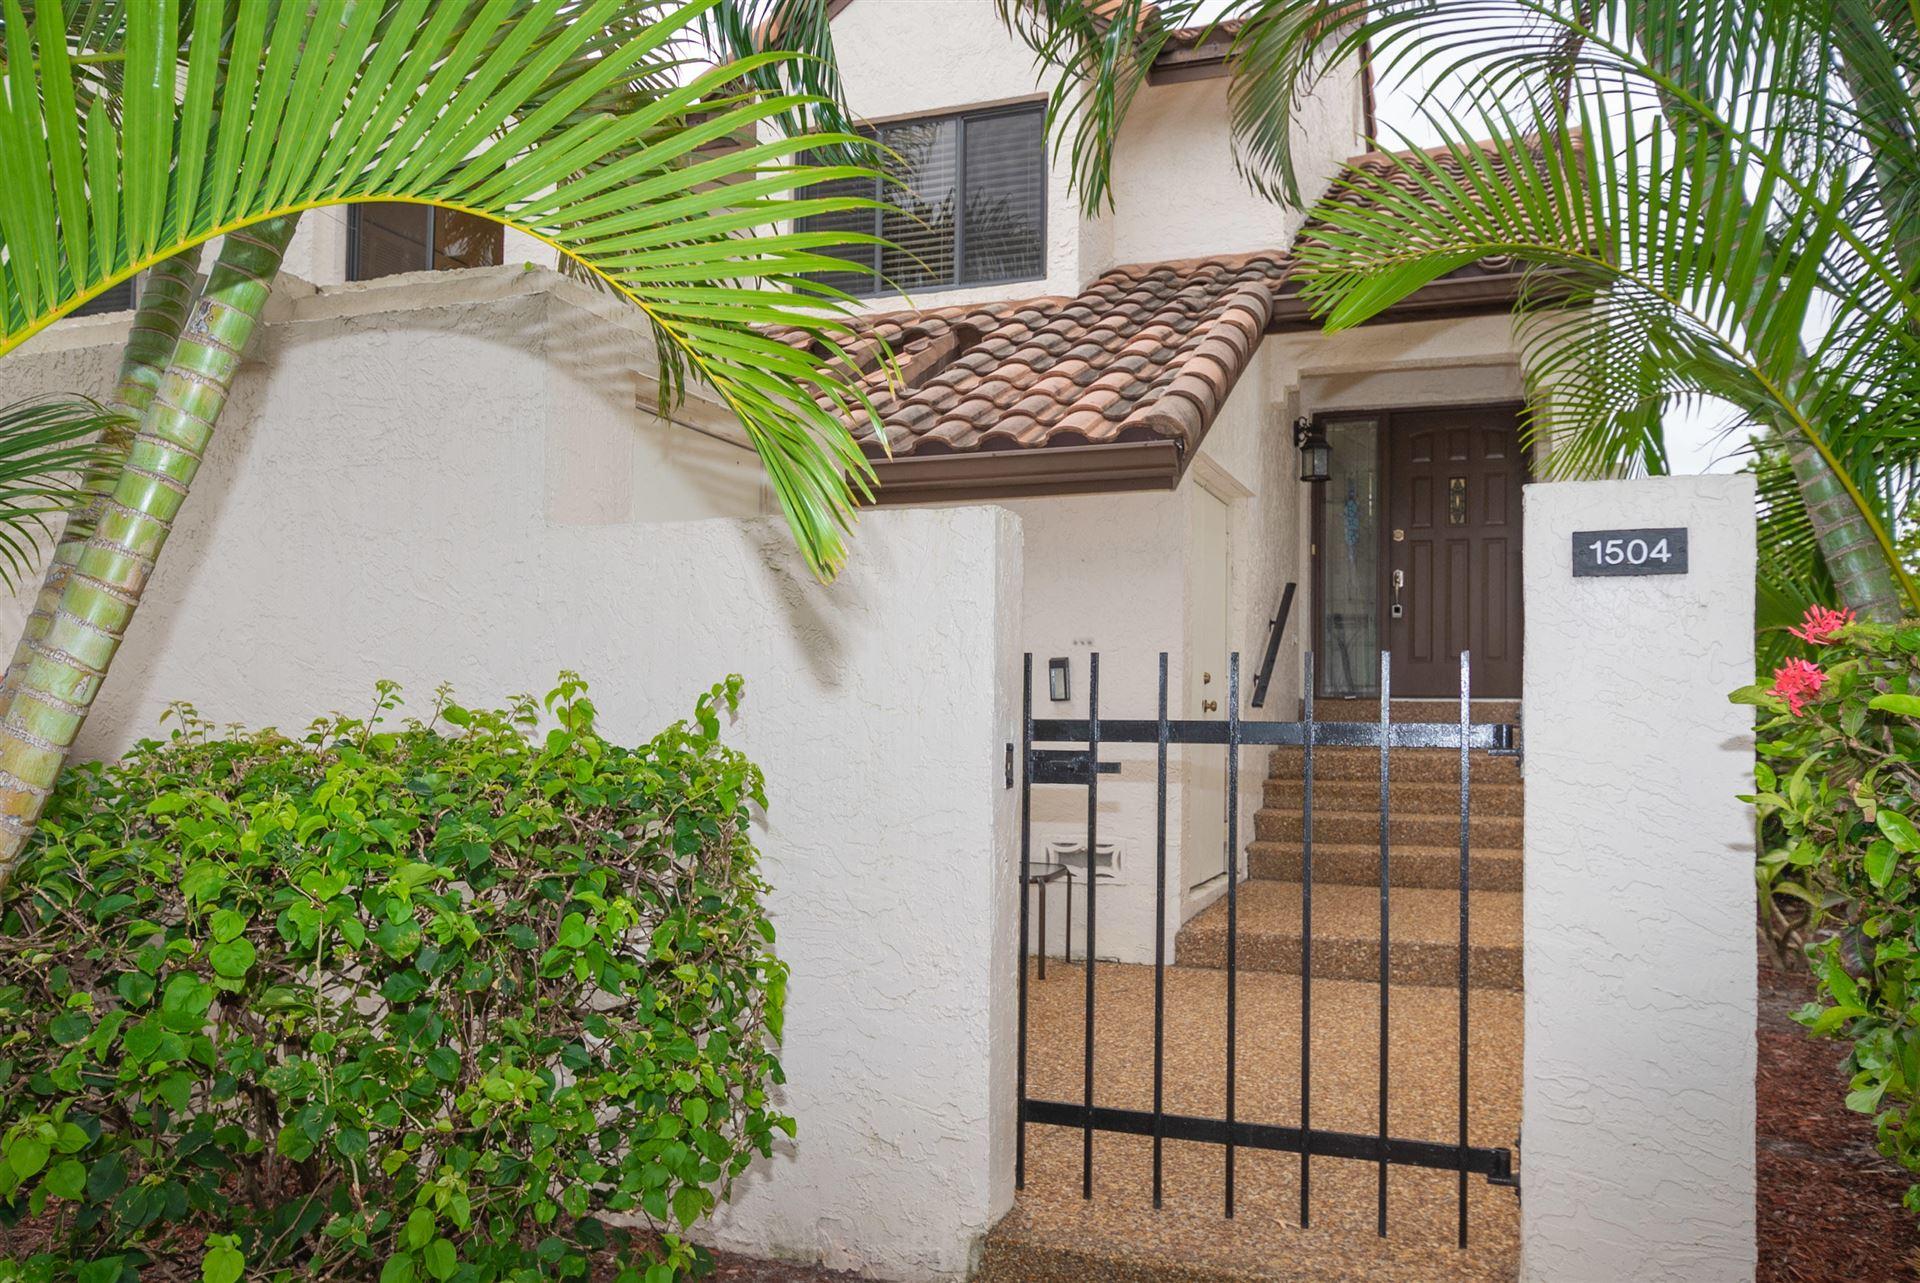 Photo of 7896 Seville Place #1504, Boca Raton, FL 33433 (MLS # RX-10674659)